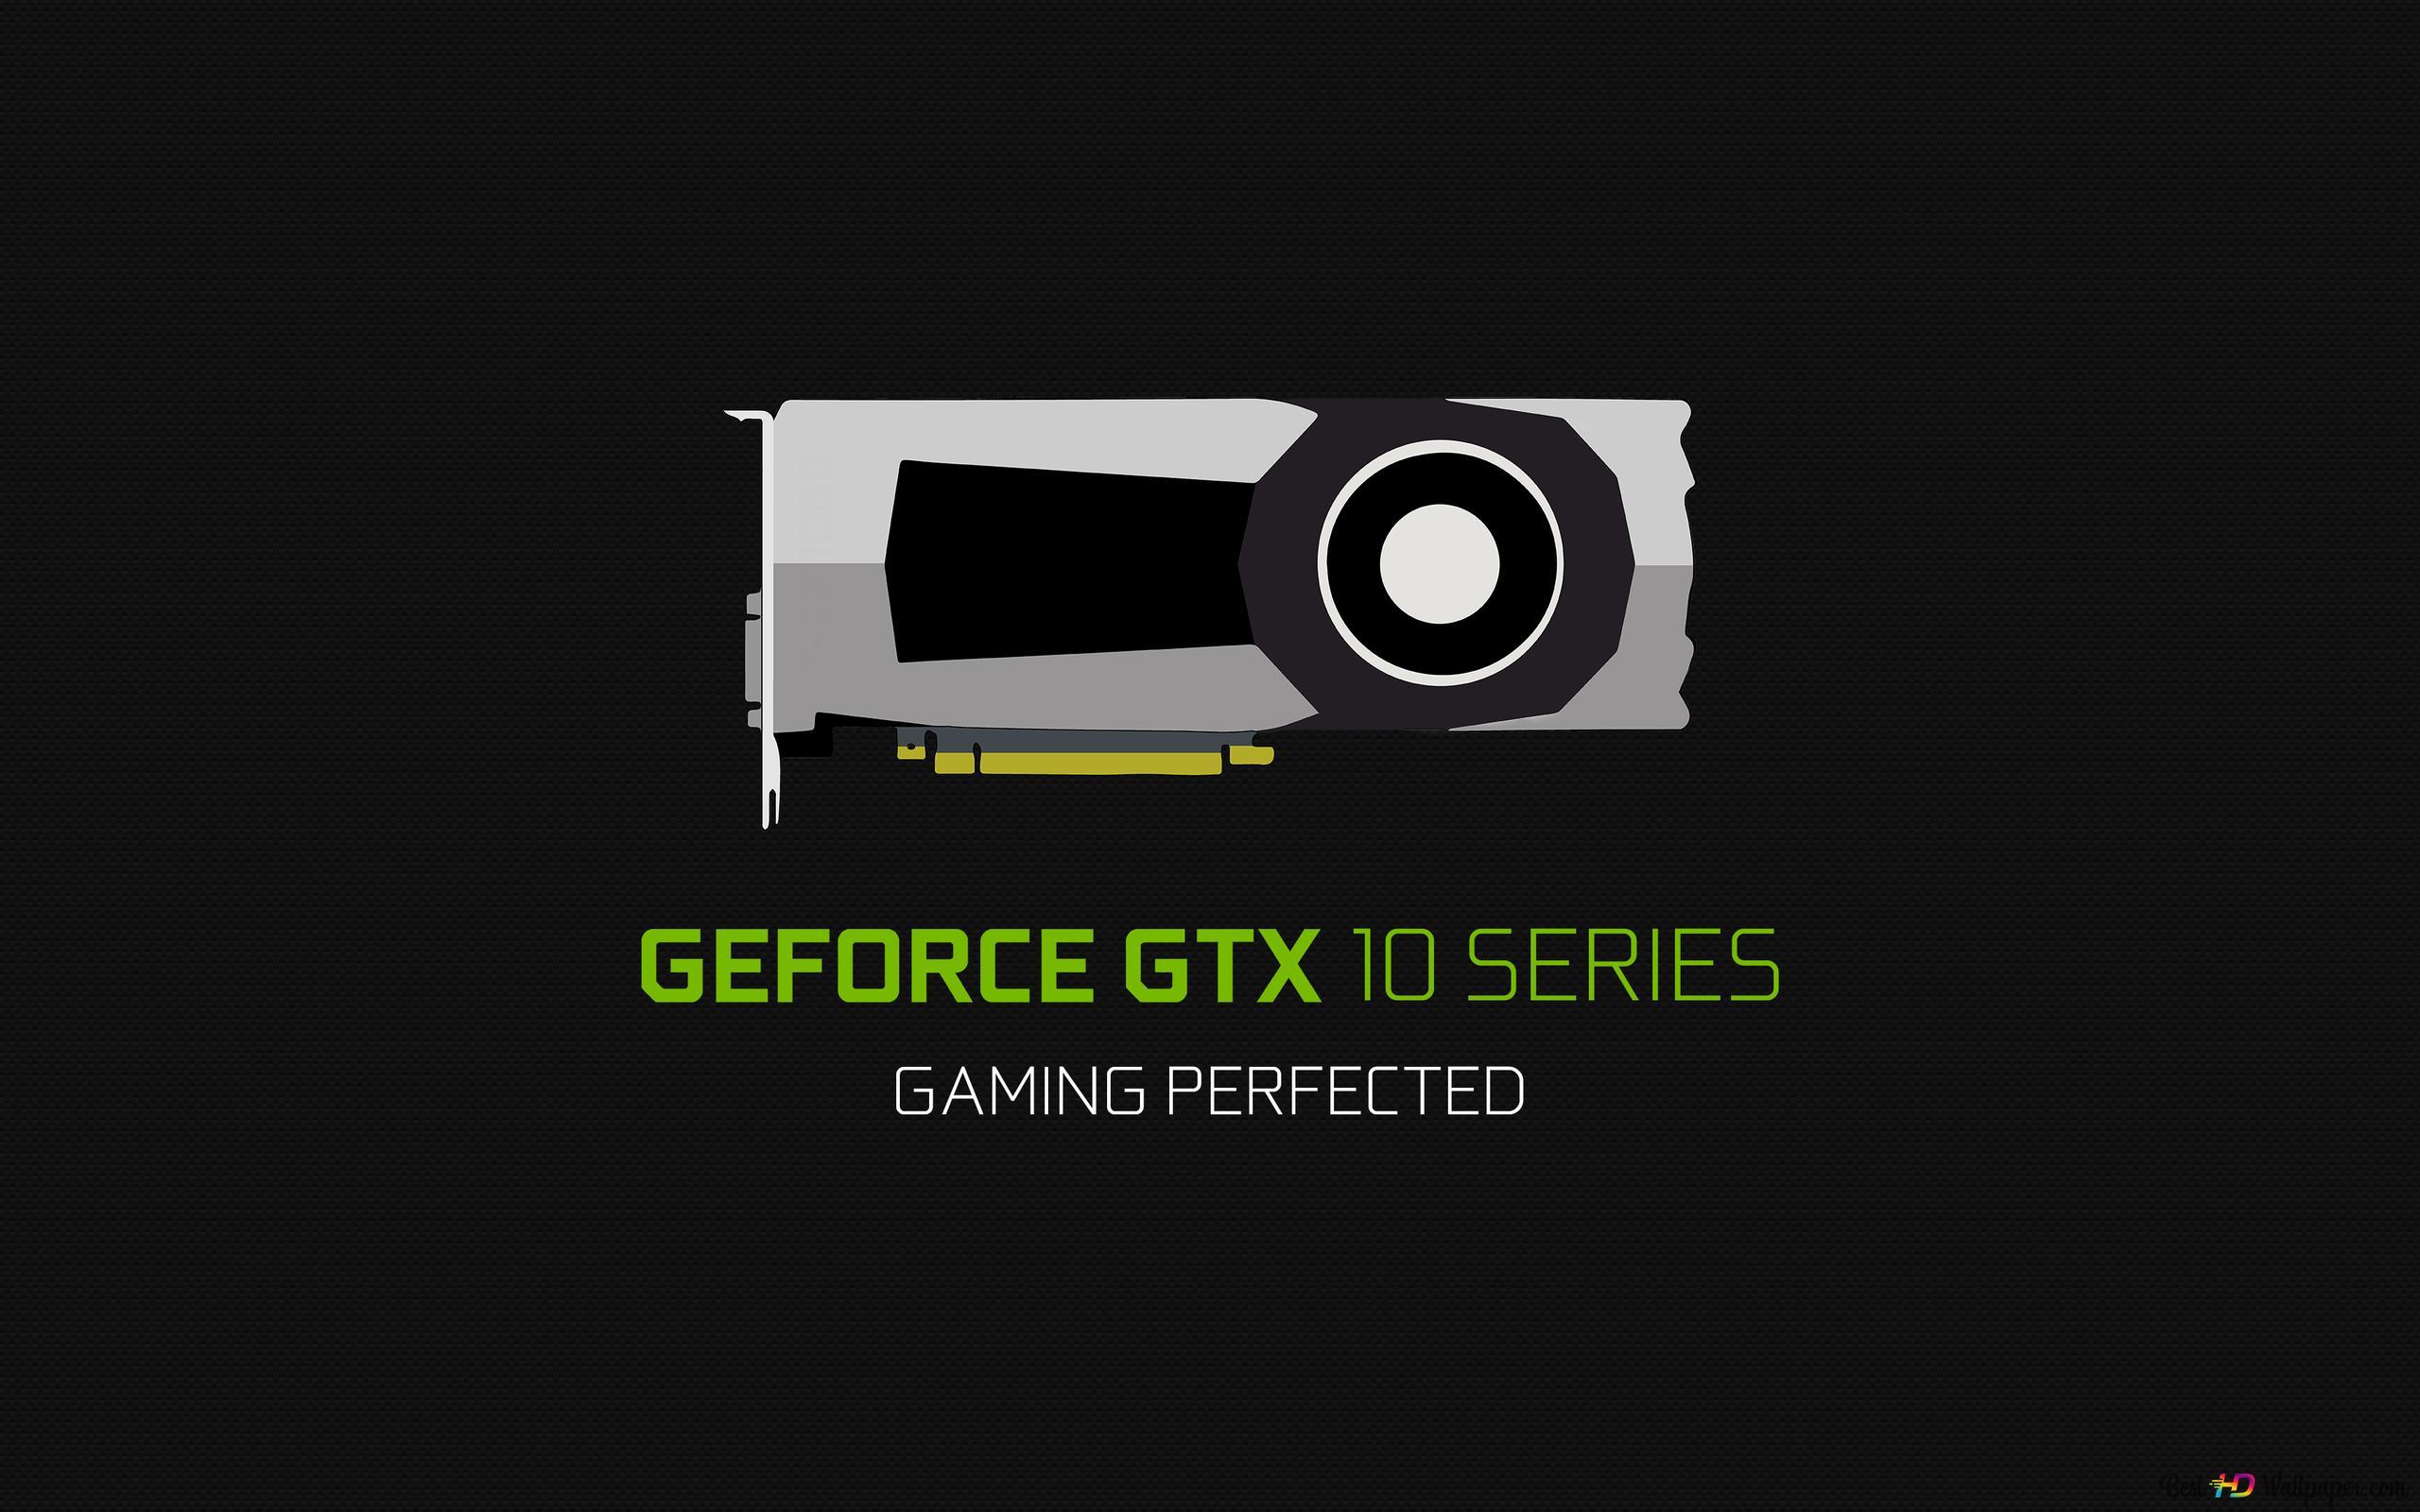 Nvidiaののgeforce Gtx 10シリーズ ゲームが完成 Hd壁紙のダウンロード